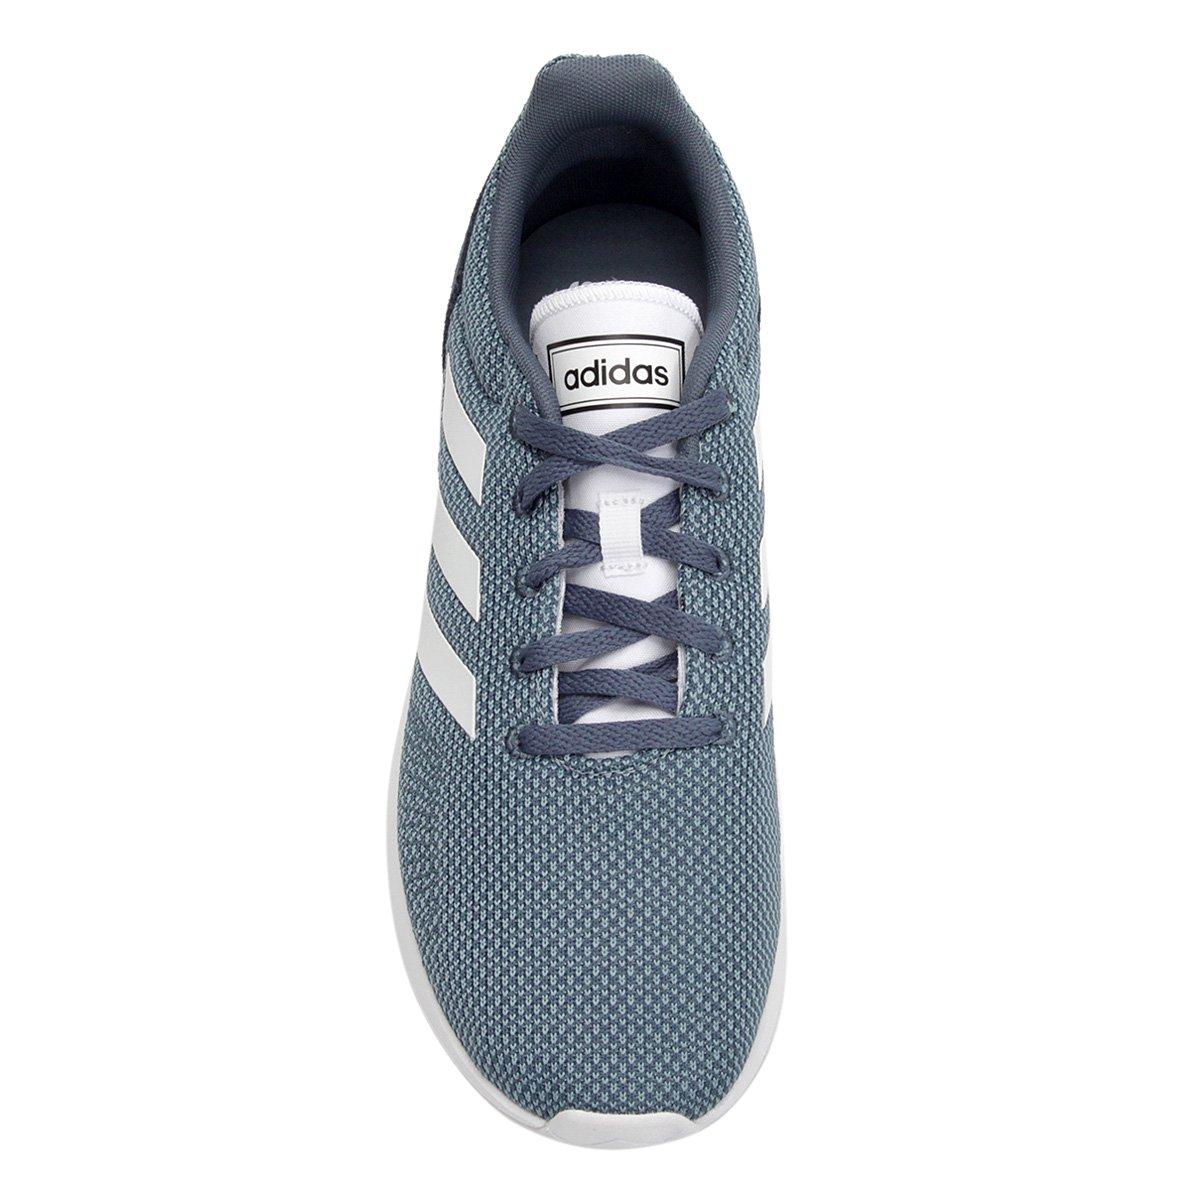 Retro Branco Couro Si Modern Tênis e Azul Masculino Adidas nv1zEwPR